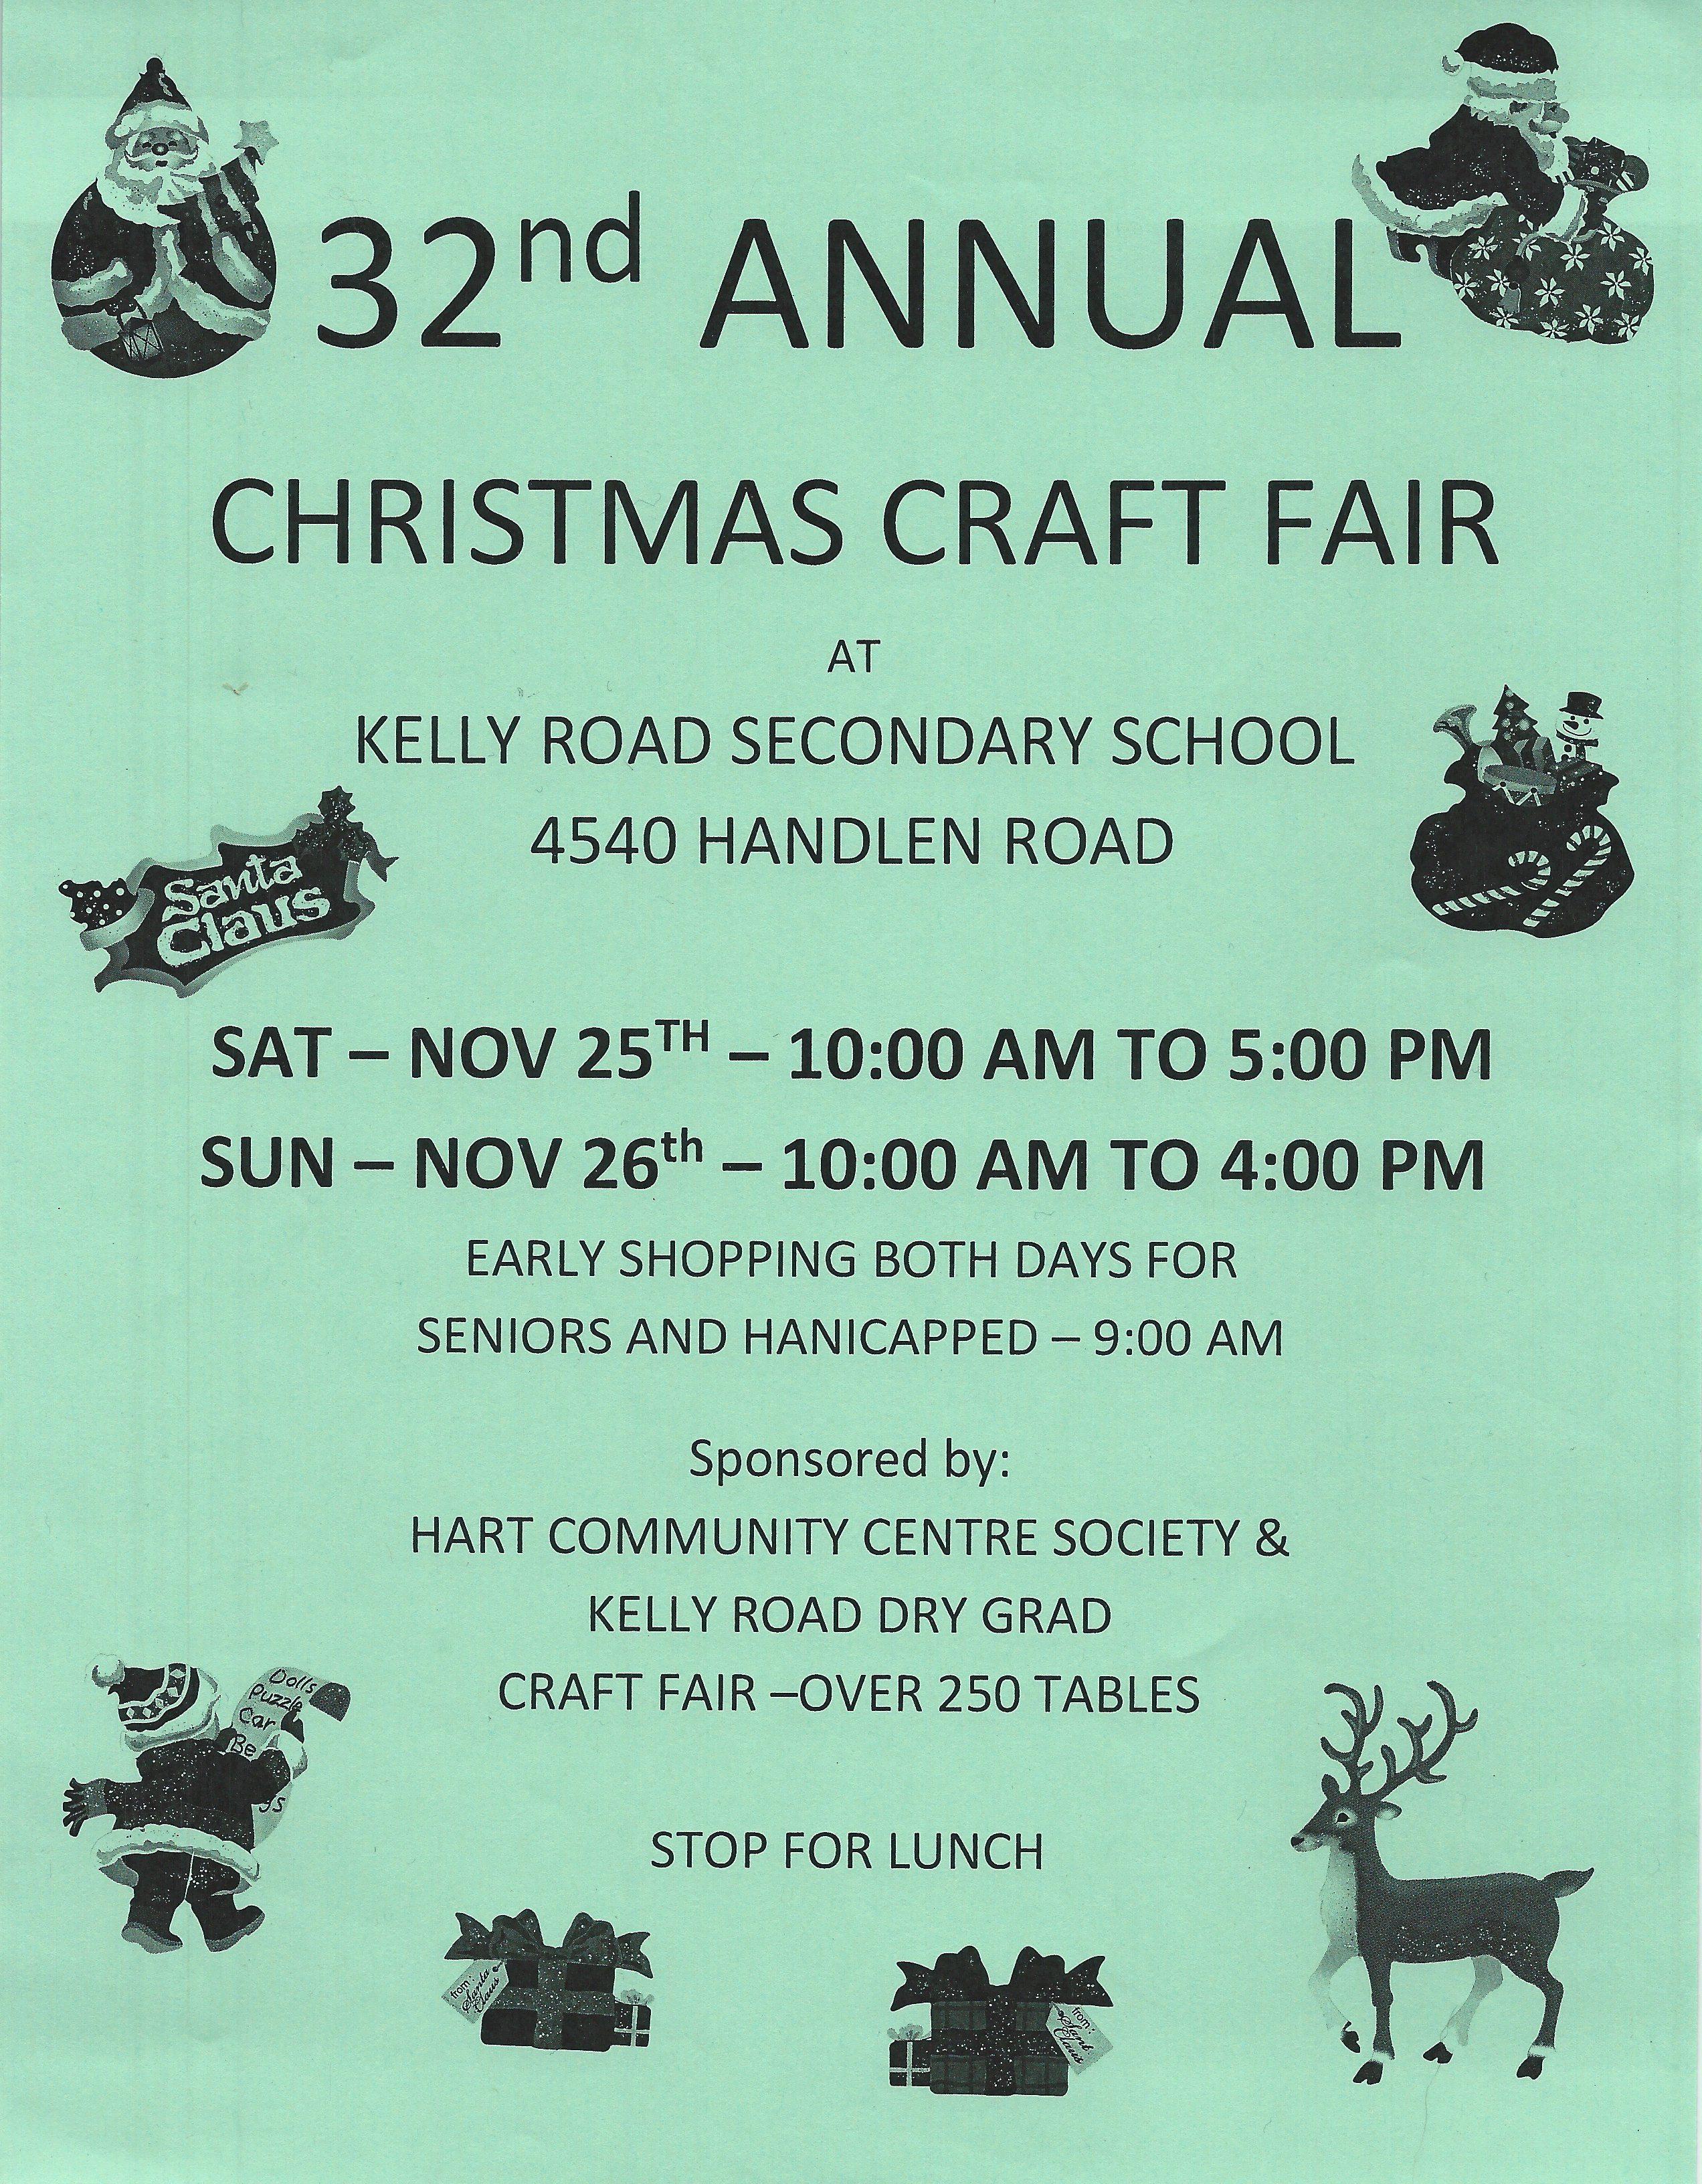 Kelly Road Secondary Craft Fair